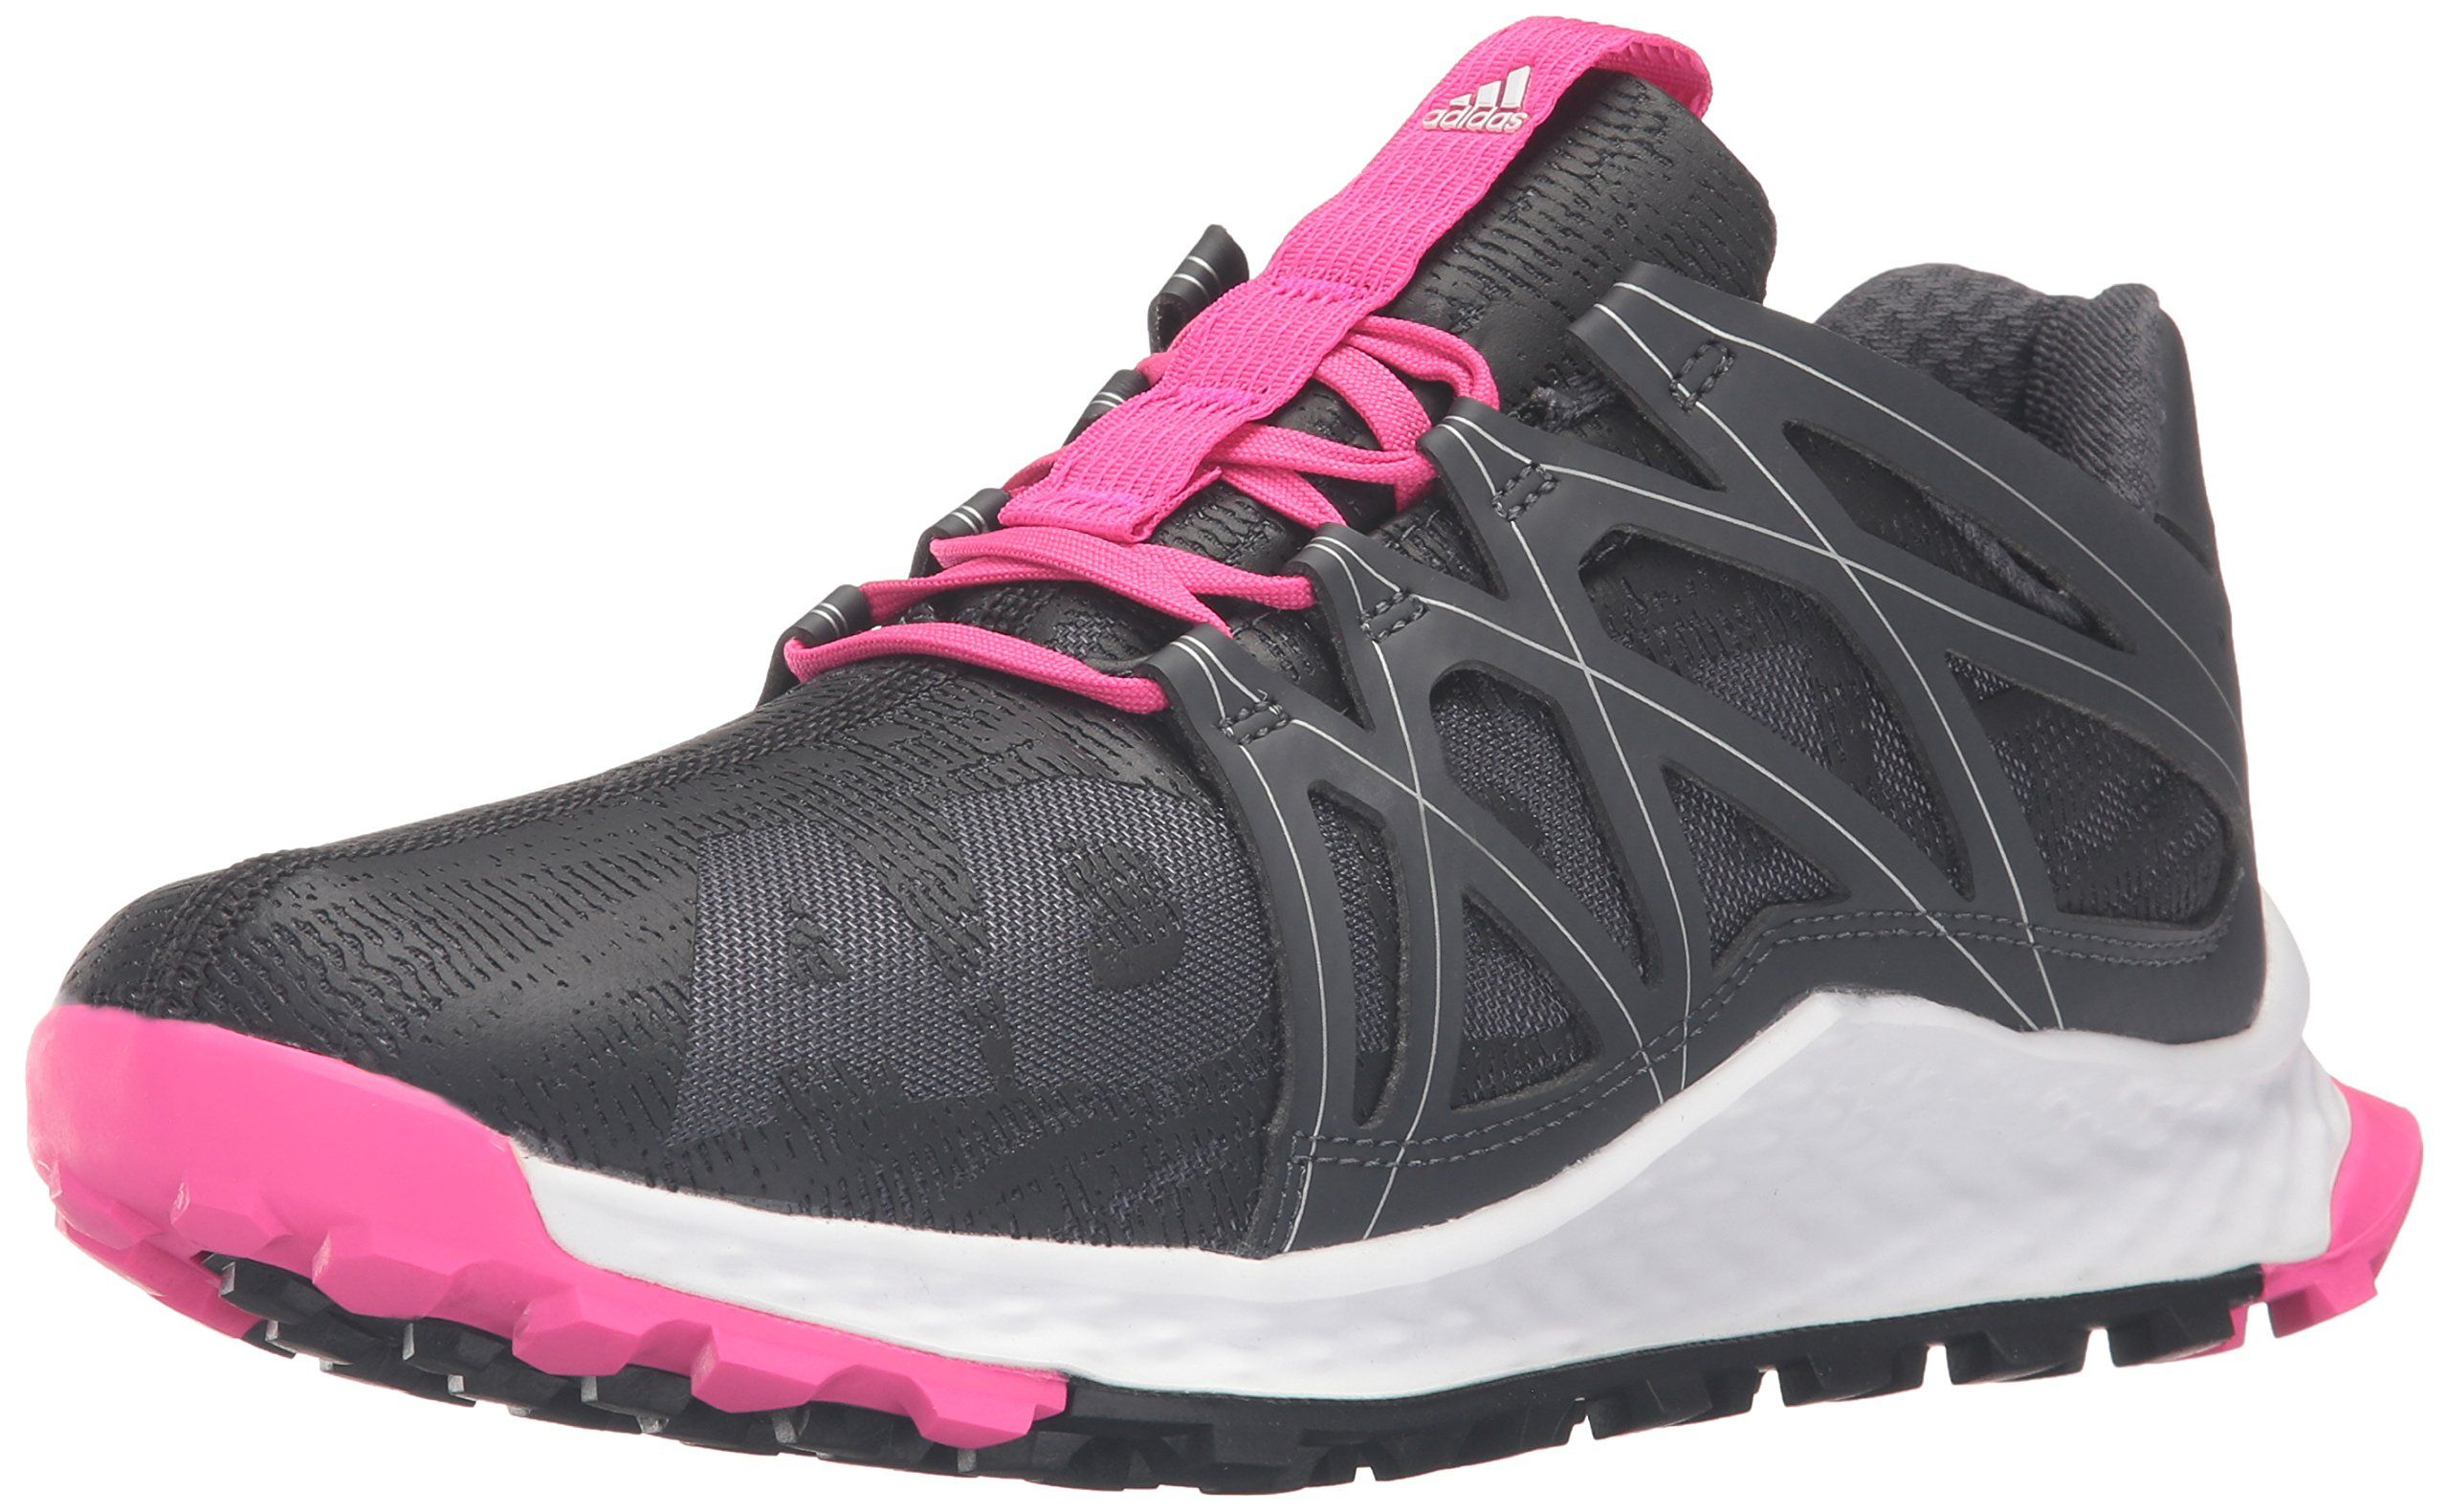 9d2f94049 adidas Performance Women s Vigor Bounce w Trail Runner